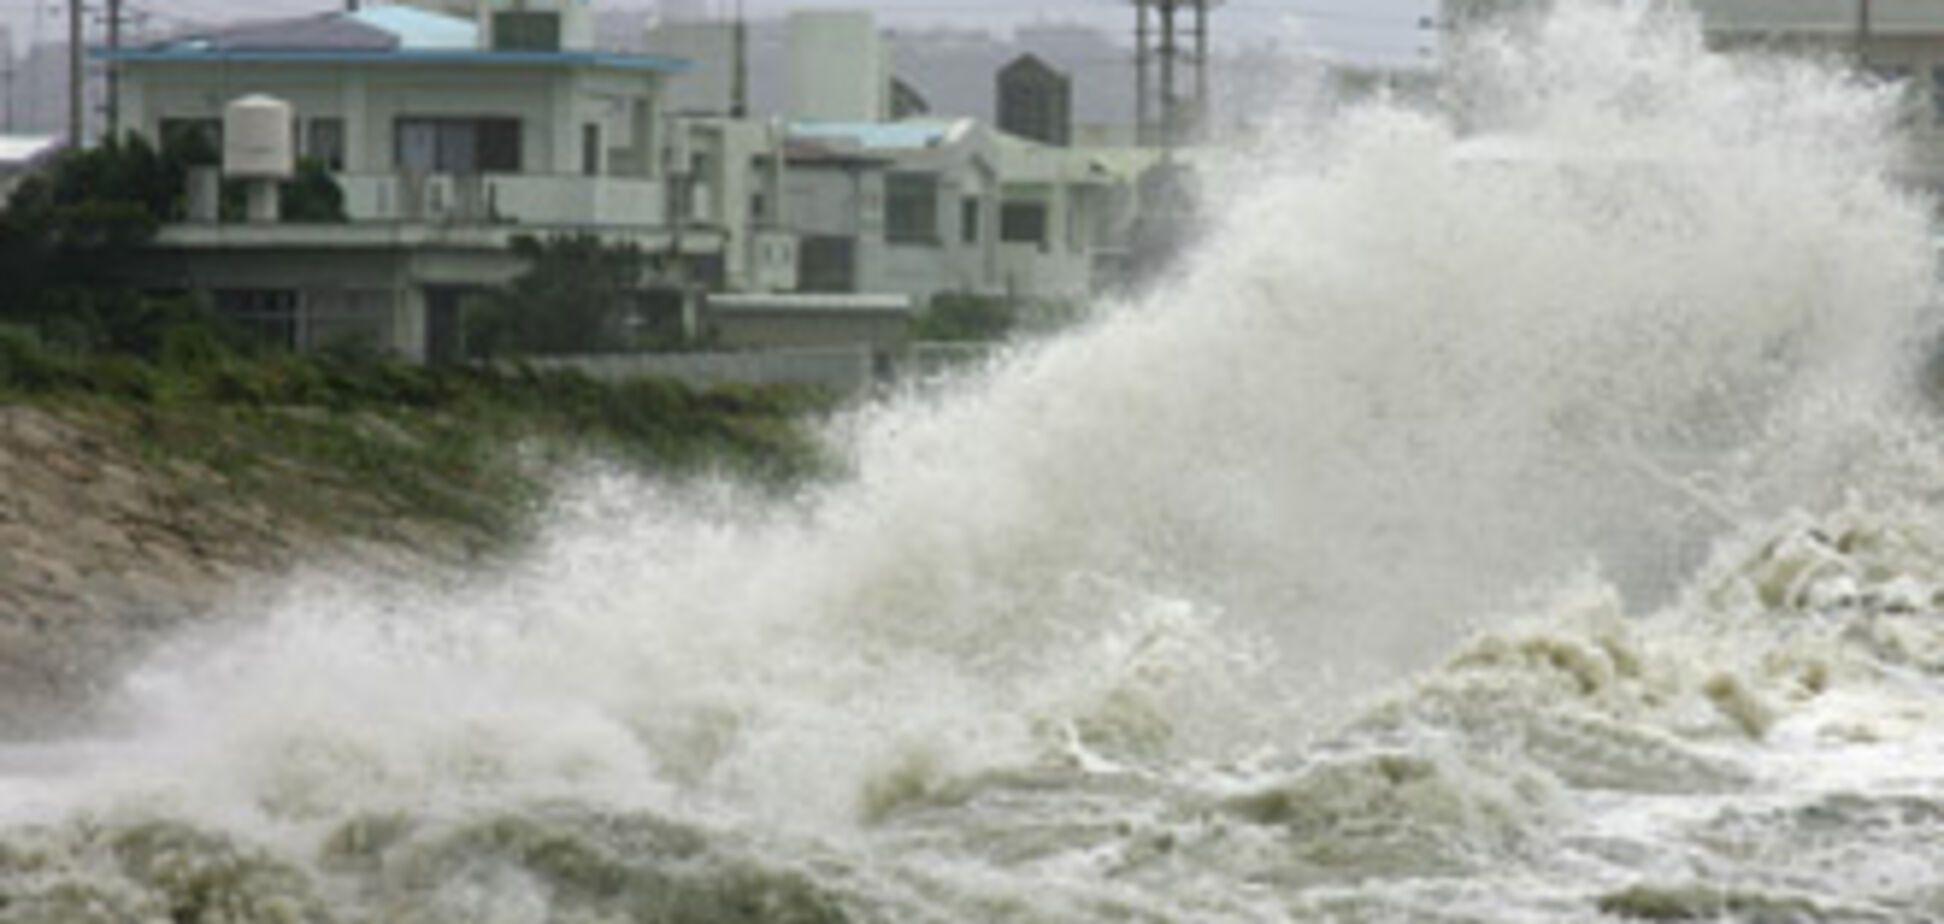 Миллион китайцев эвакуировали в ожидании тайфуна